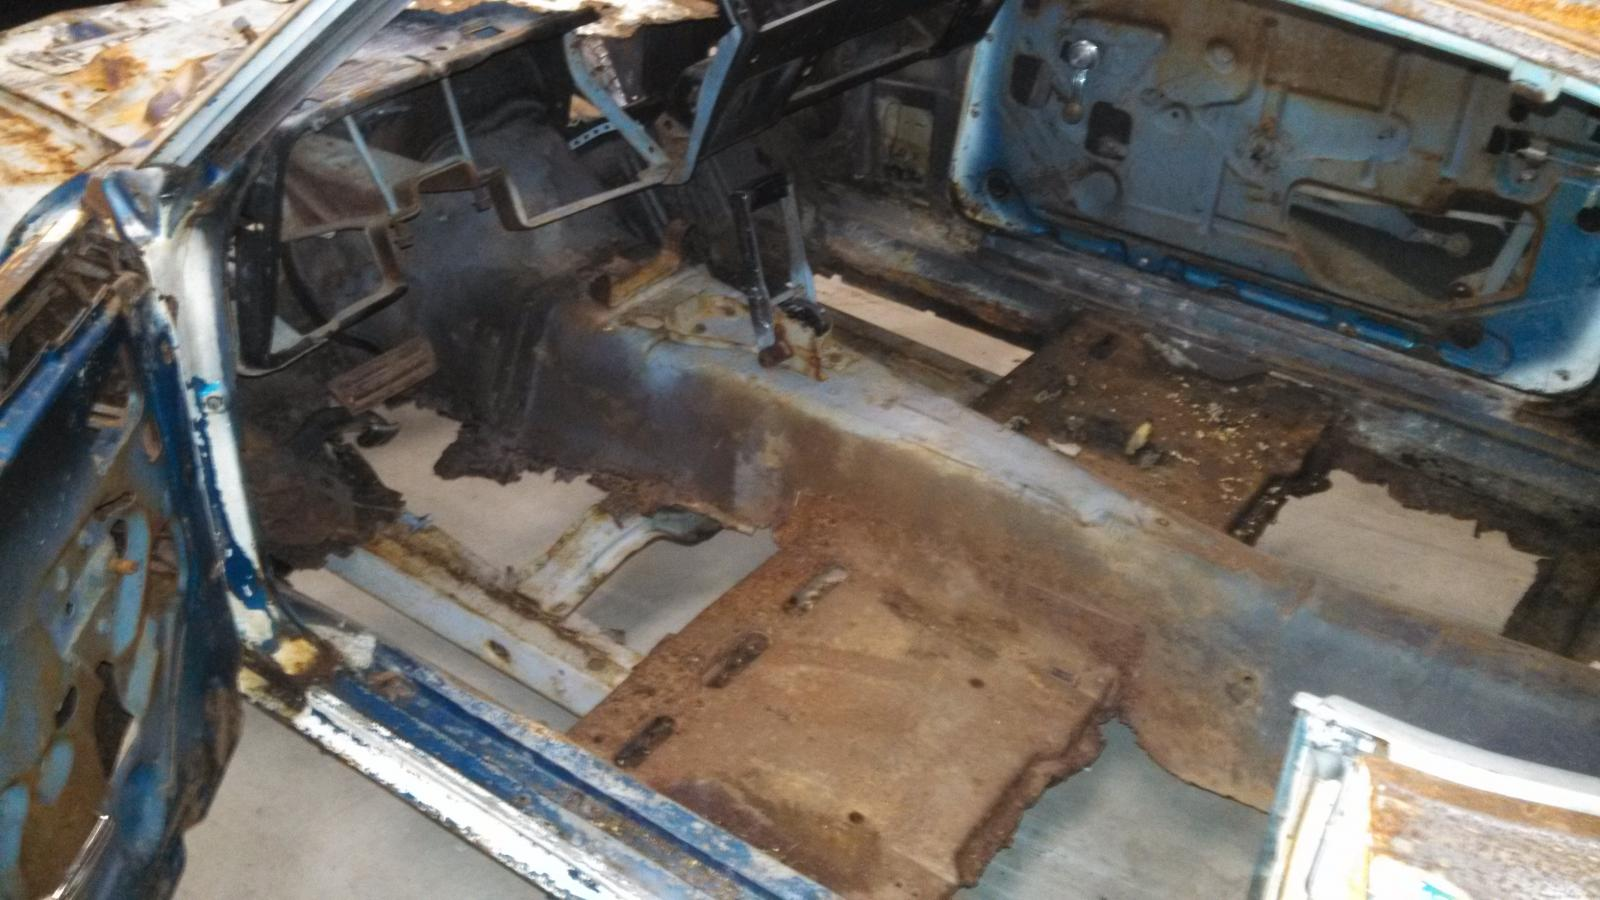 35th anniversary 69 camaro build for 1968 mustang floor pan replacement